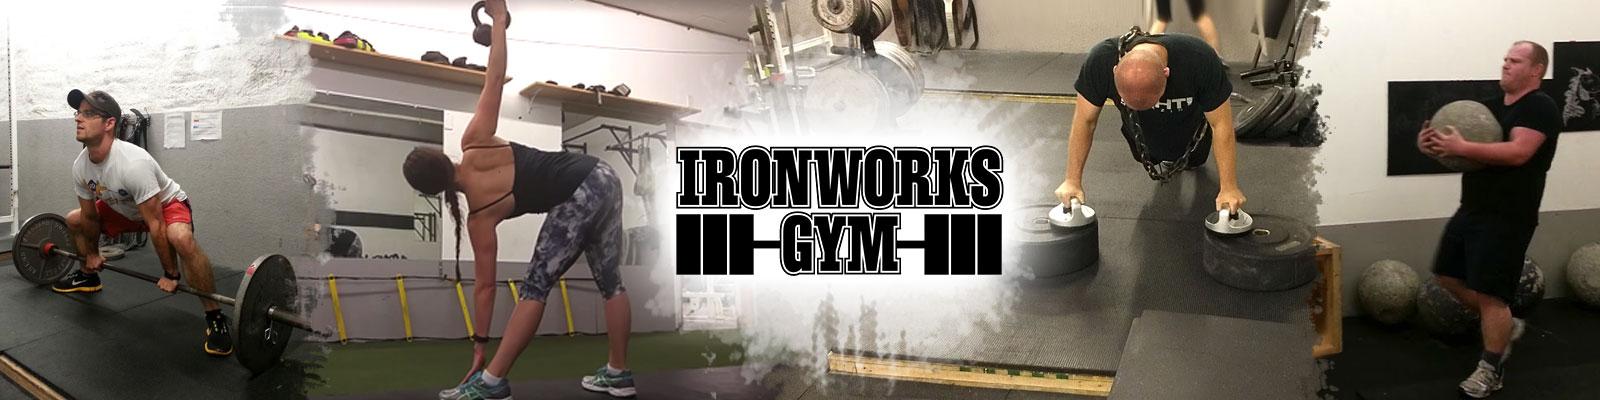 Ironworks Gym Binghamton BiziFit